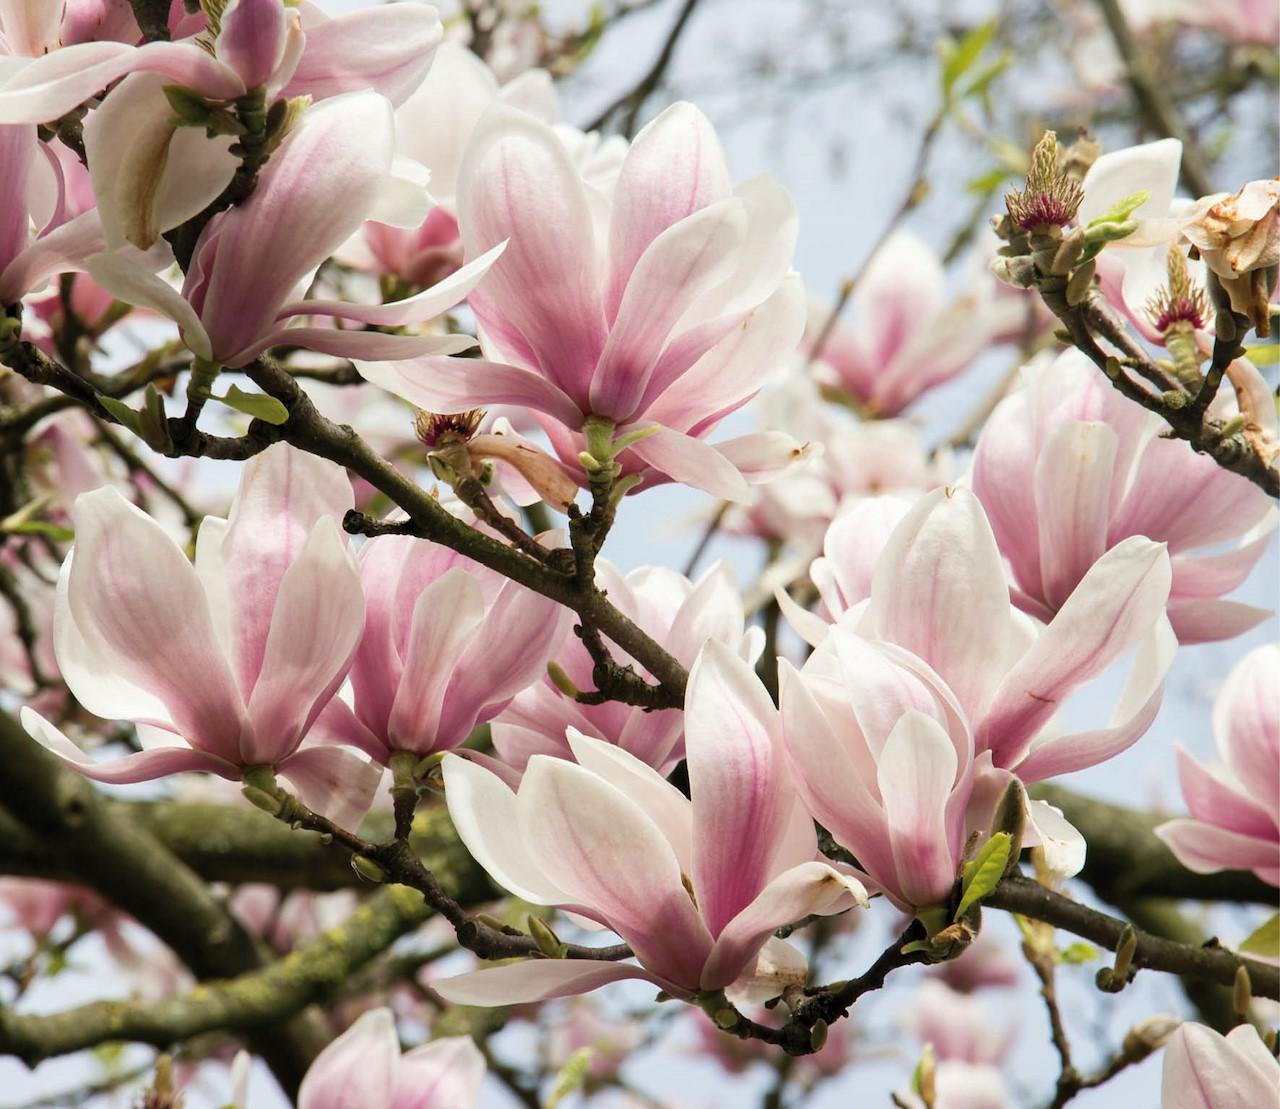 De allermooiste magnolia's voor de tuin